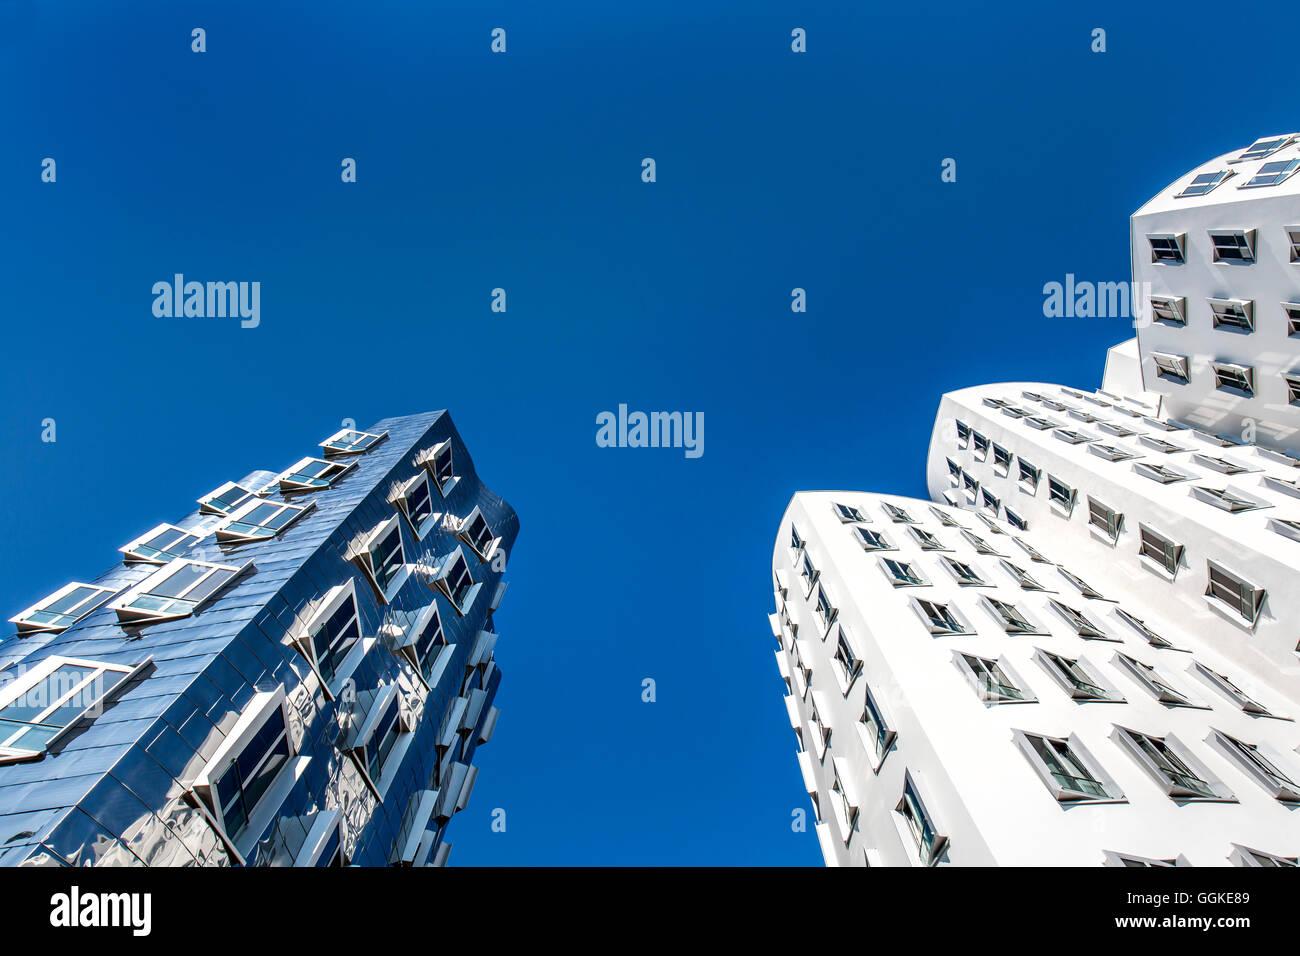 Frank Gehry edificios, Neuer Zollhof, Media Harbour, Dusseldorf, Renania del Norte-Westfalia, Alemania Imagen De Stock